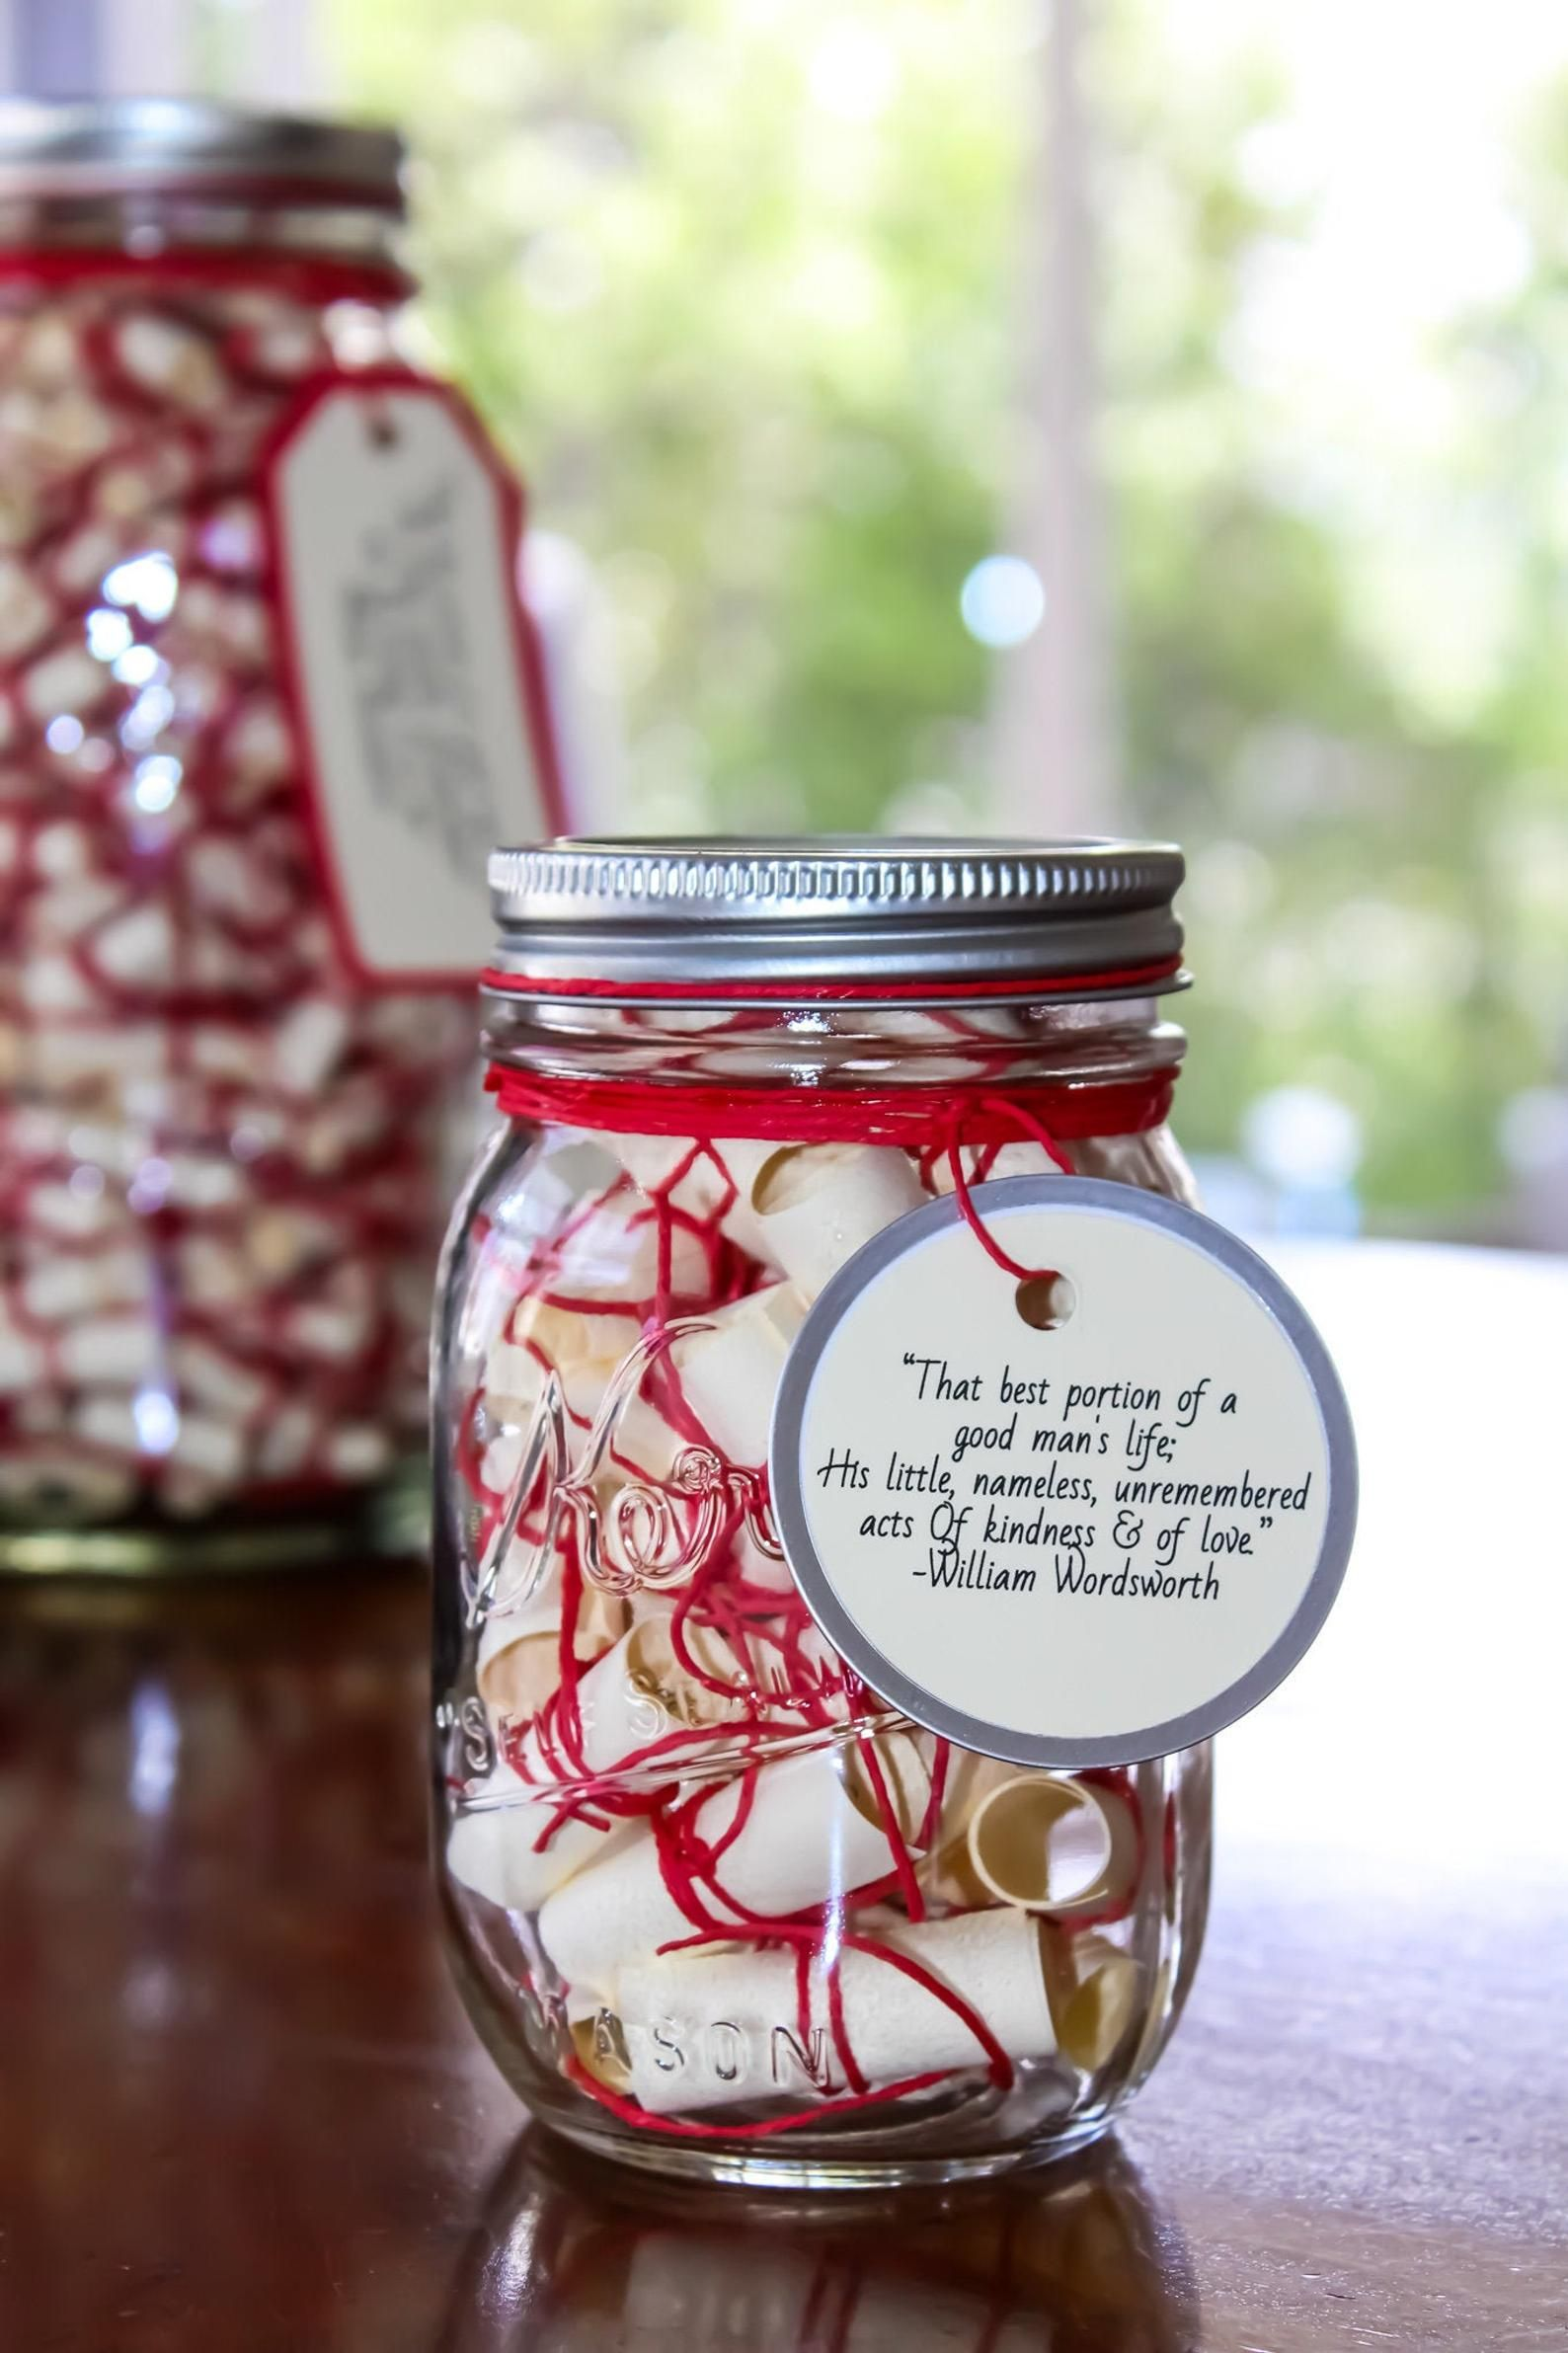 Message Filled Mason Jar Love Wish Jar Mason Jars Love Wishes Jar